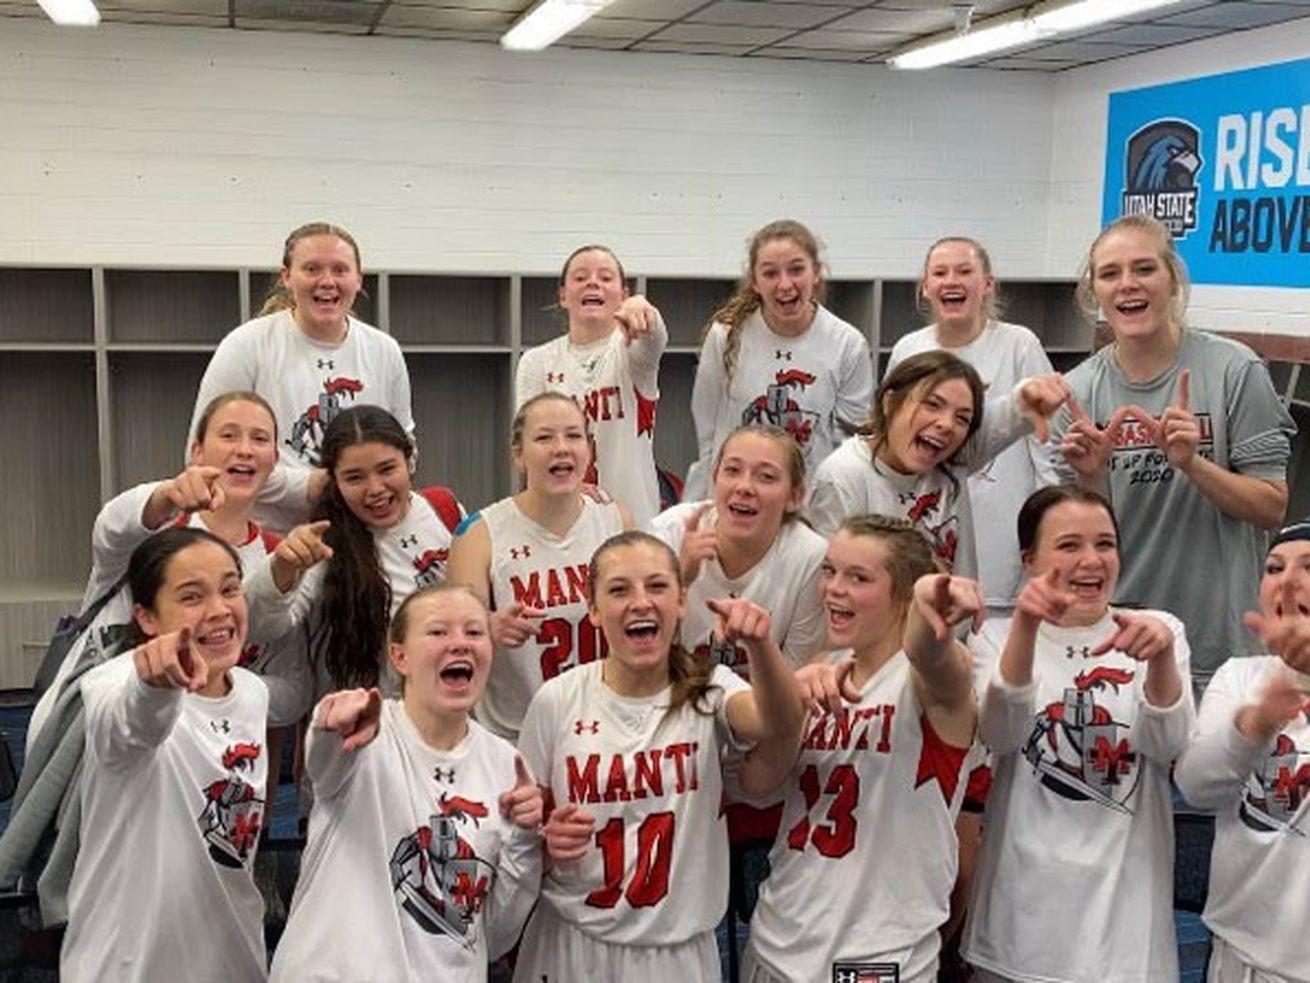 High School Girls Basketball Manti Rallies Past Delta San Juan Ousts Defending Champ Emery In 3a Second Round In 2020 Basketball Girls S Girls Girls Softball